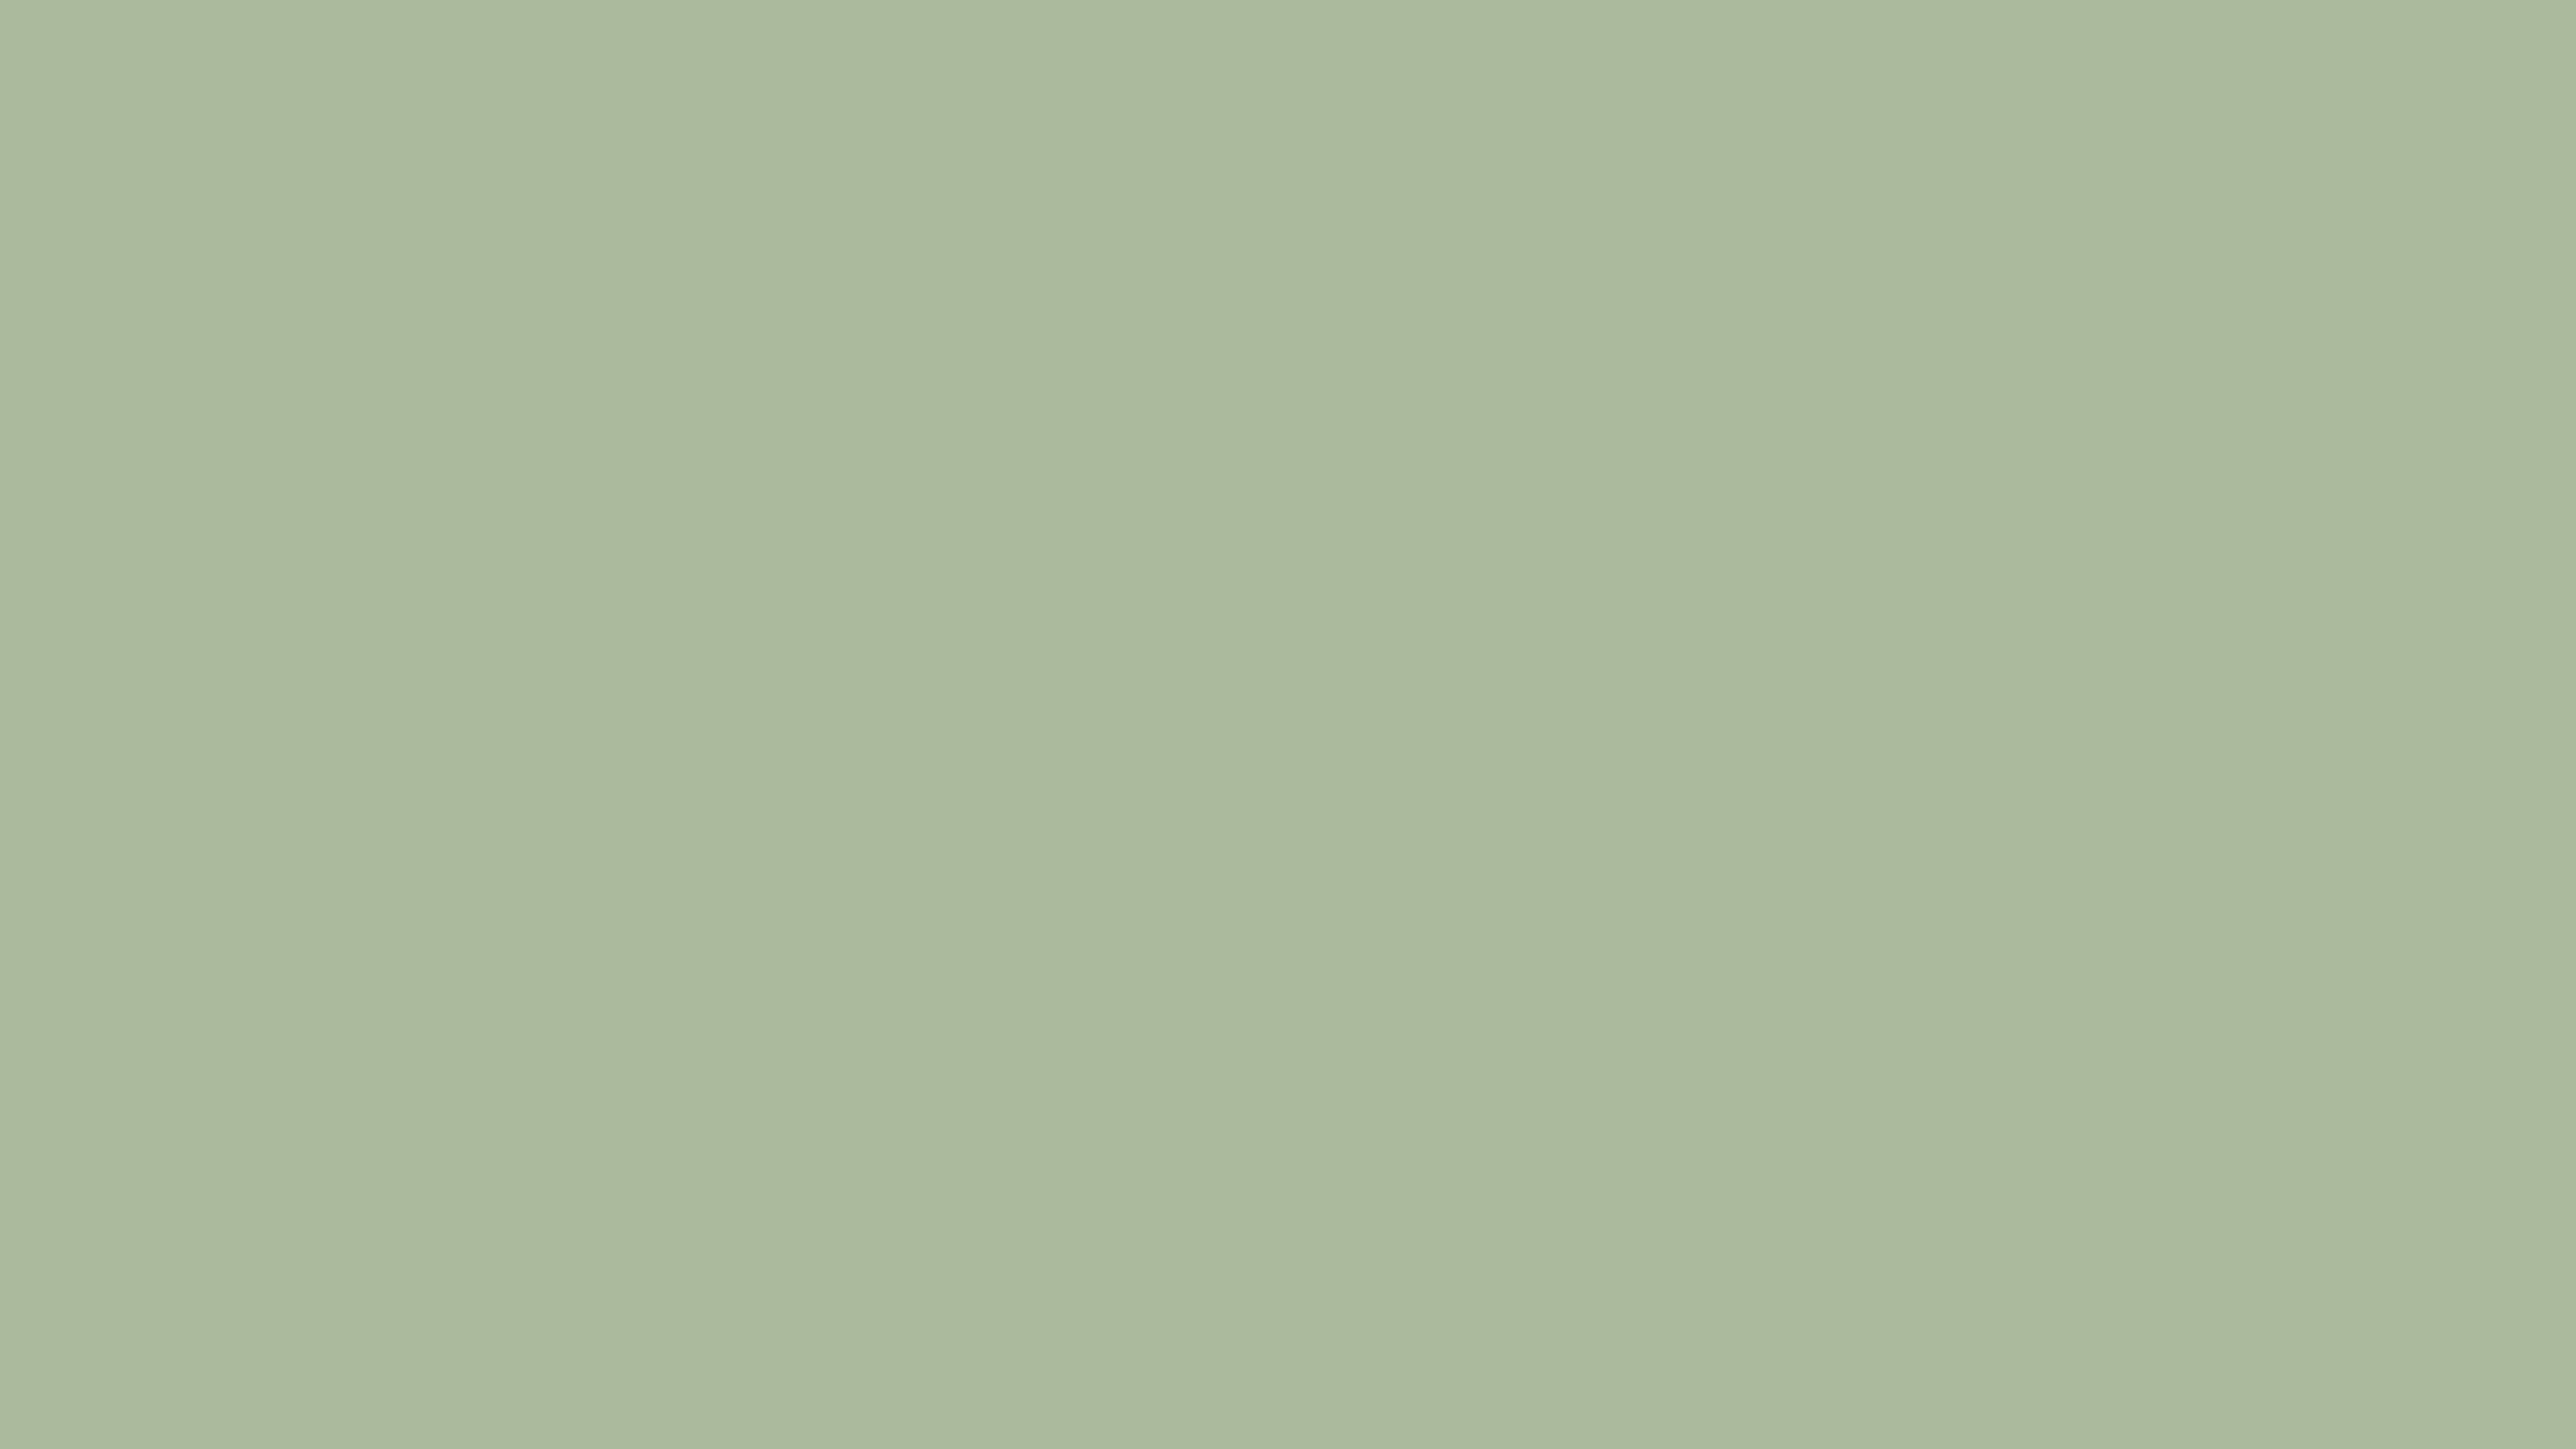 3840x2160 Laurel Green Solid Color Background